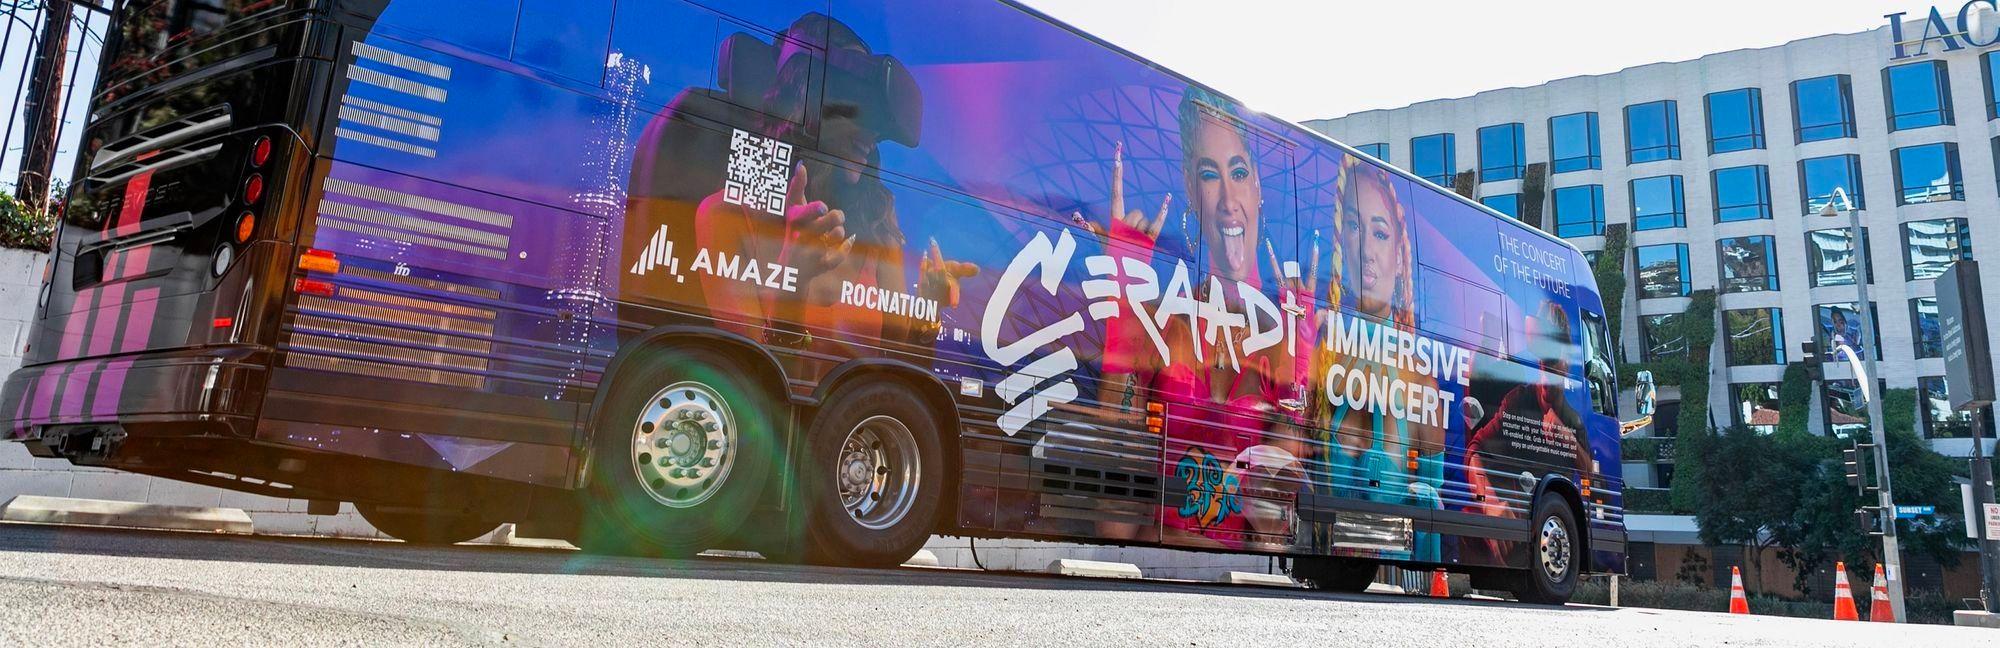 notion-tour-bus-cover.jpg